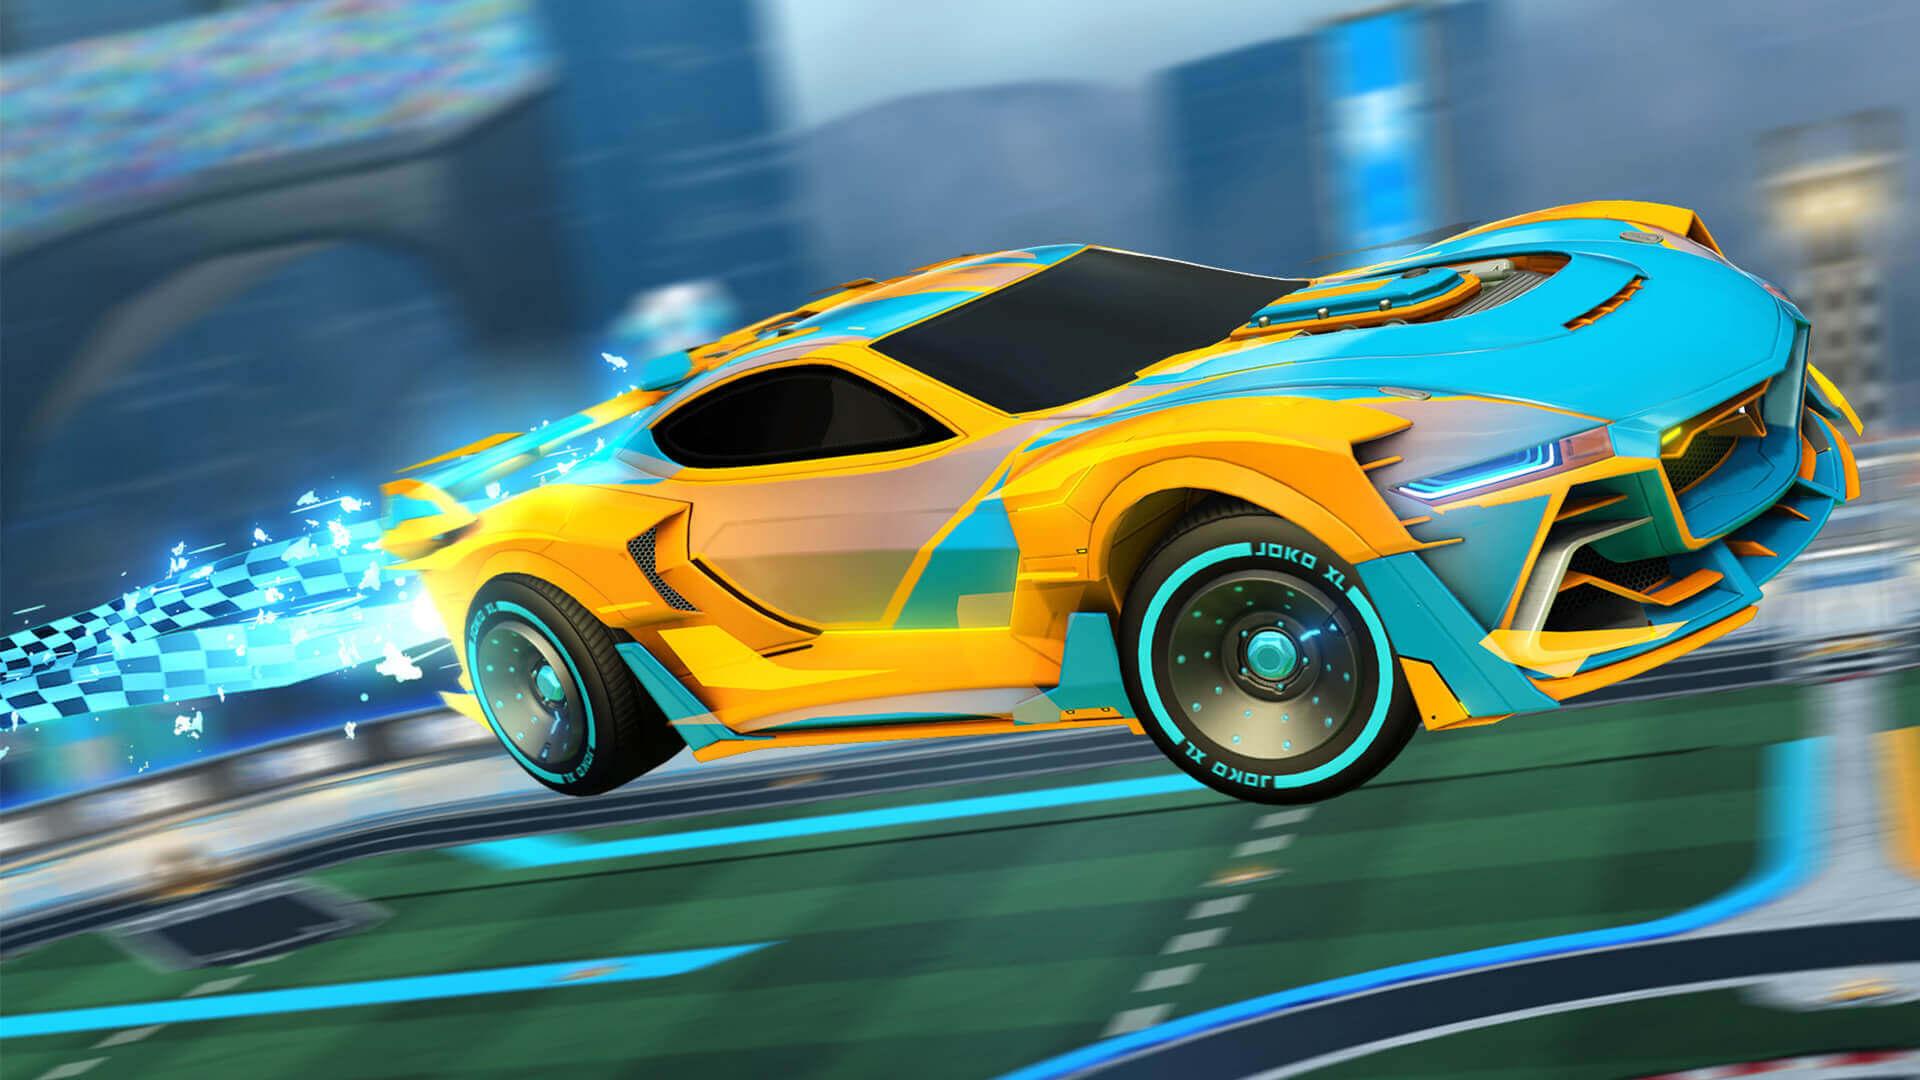 Rocket league co op arcade yarış oyunu